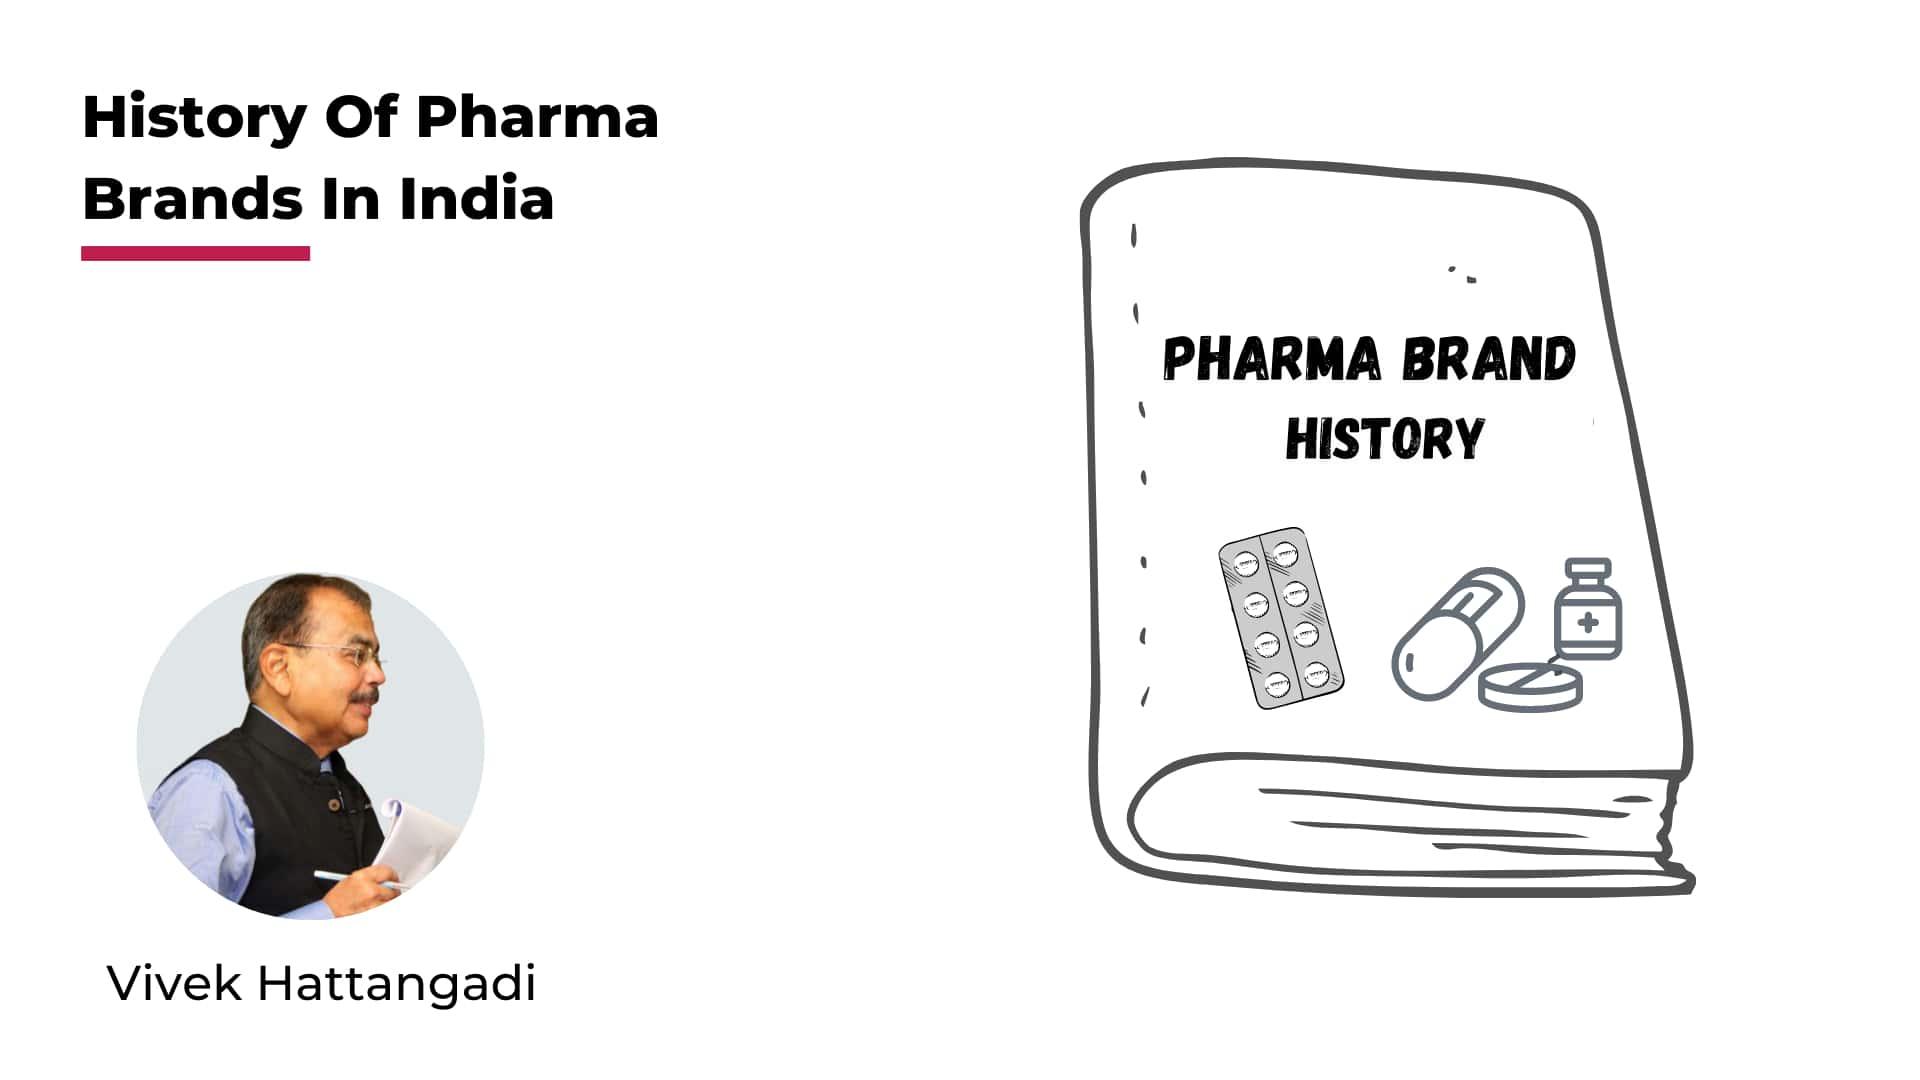 History of Pharma Brands in India